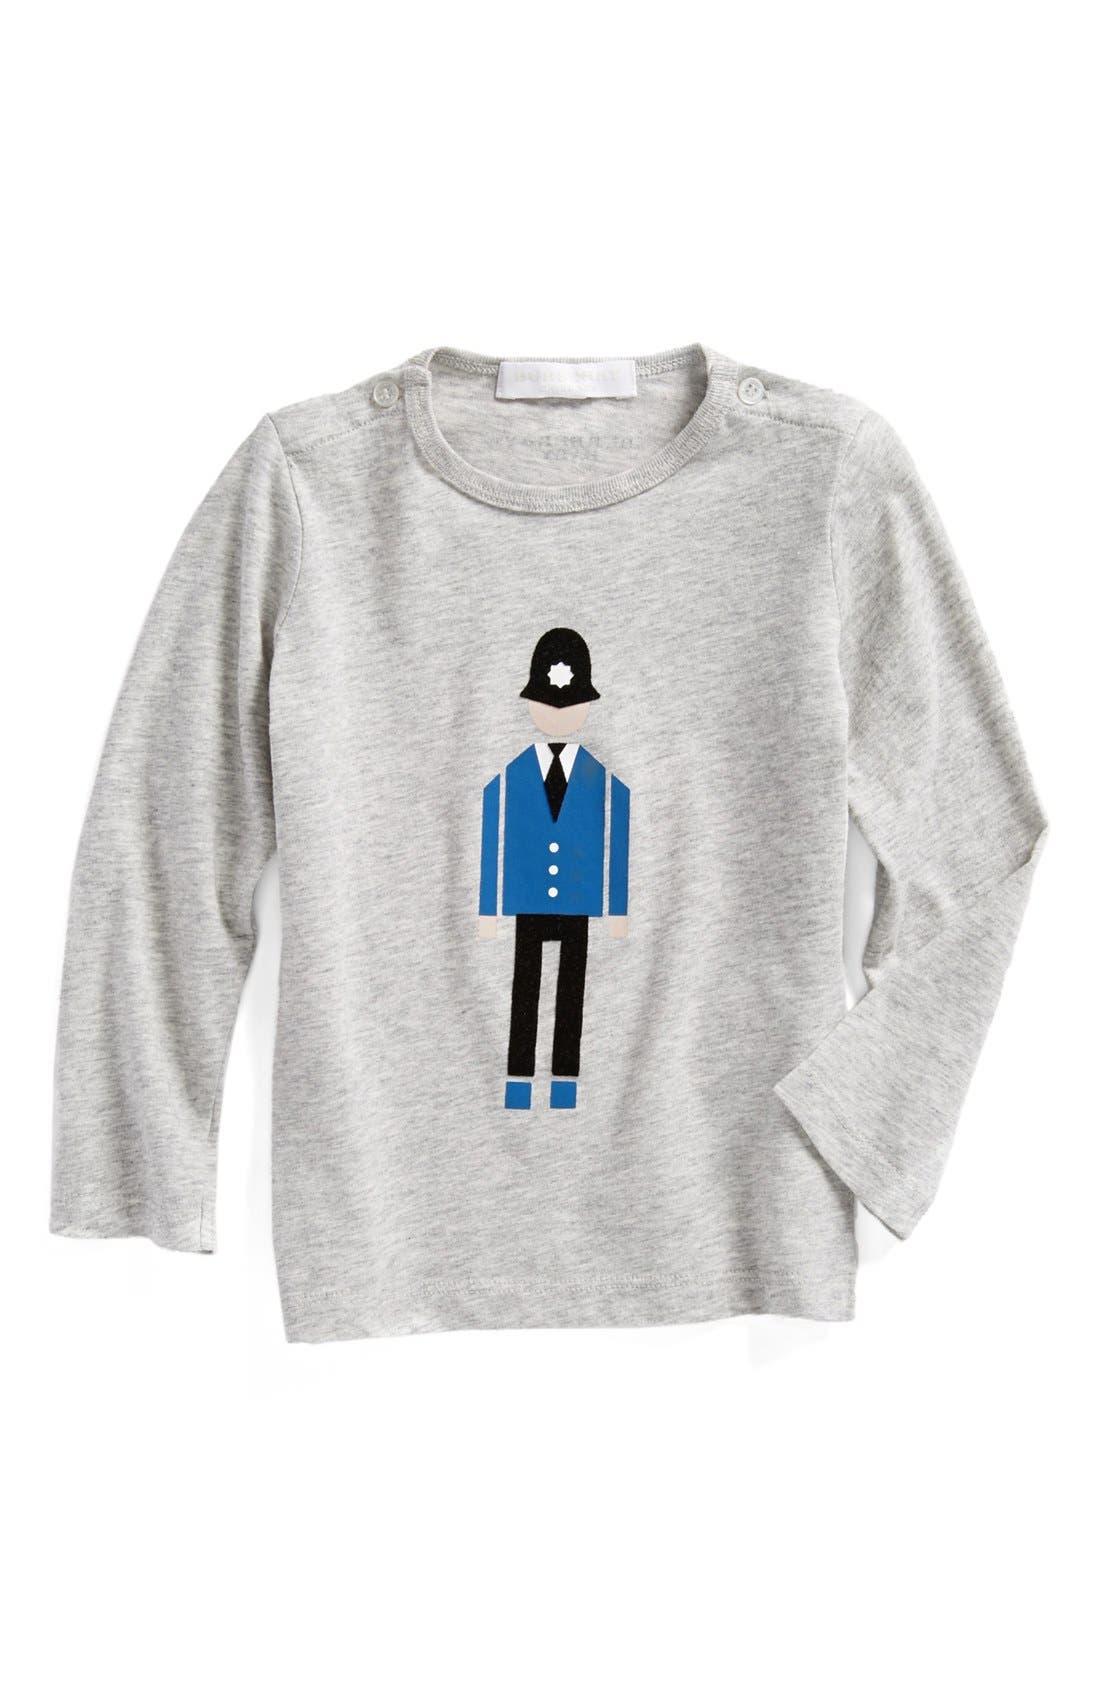 Alternate Image 1 Selected - Burberry Long Sleeve T-Shirt (Toddler)